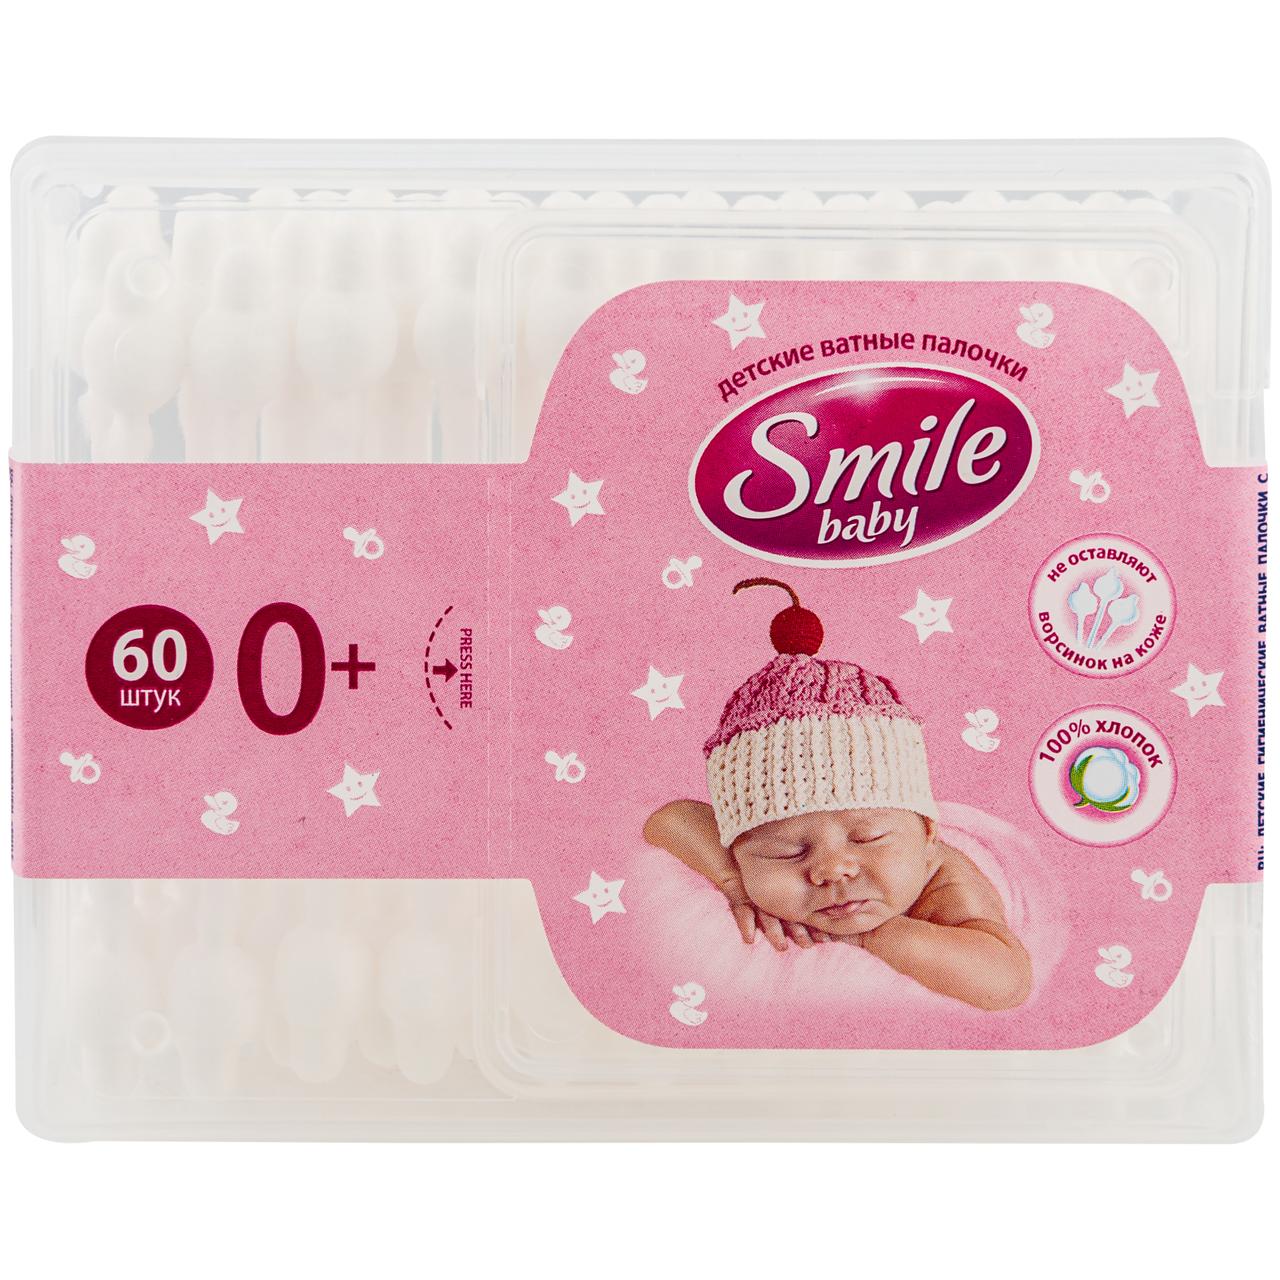 Палички ватні Smile Baby з обмежувачем 60шт/уп